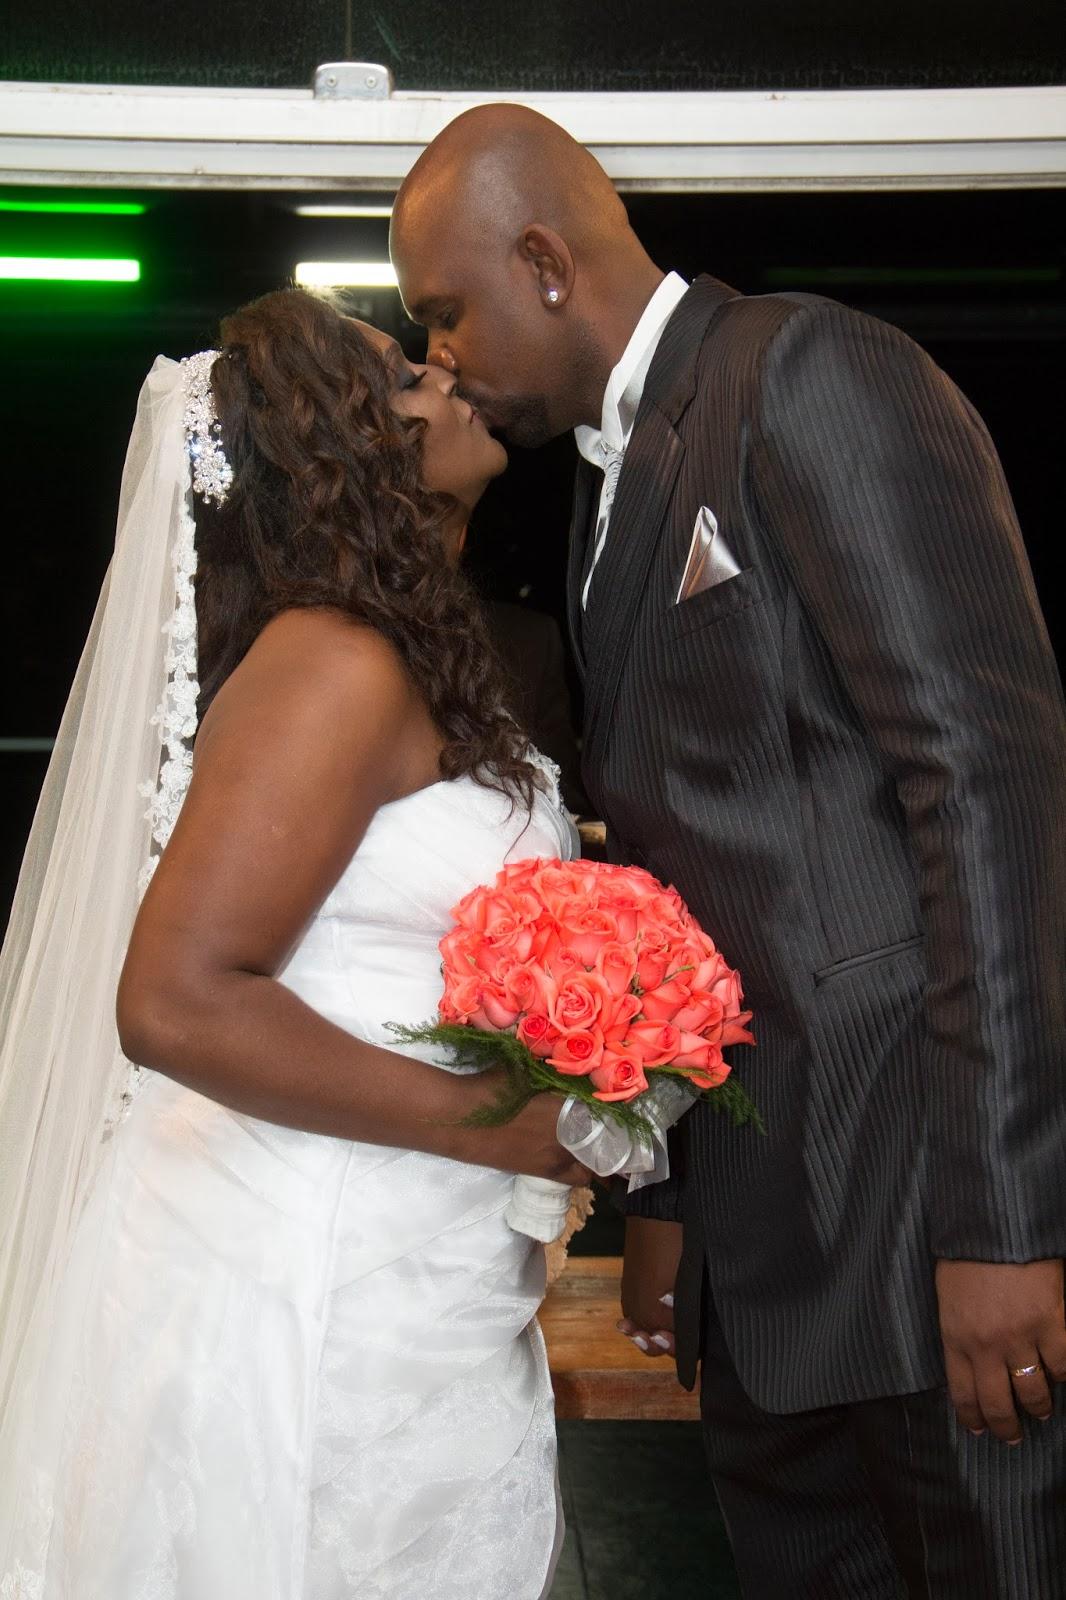 historia-amor-fe-cerimonia-beijo-1